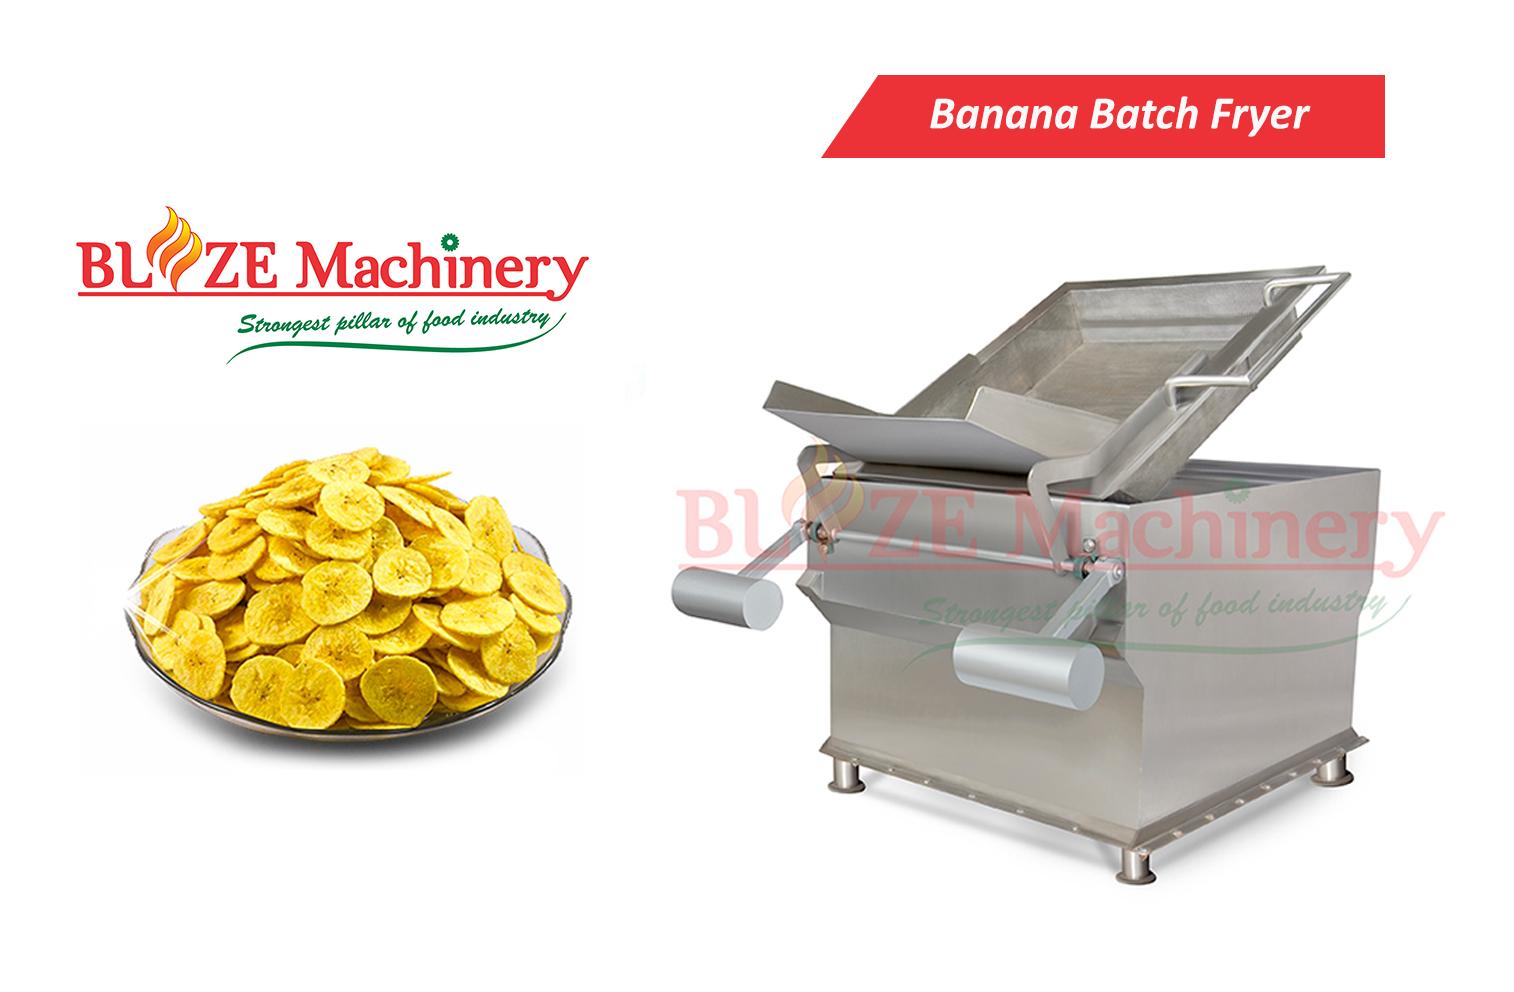 Banana Batch Fryer